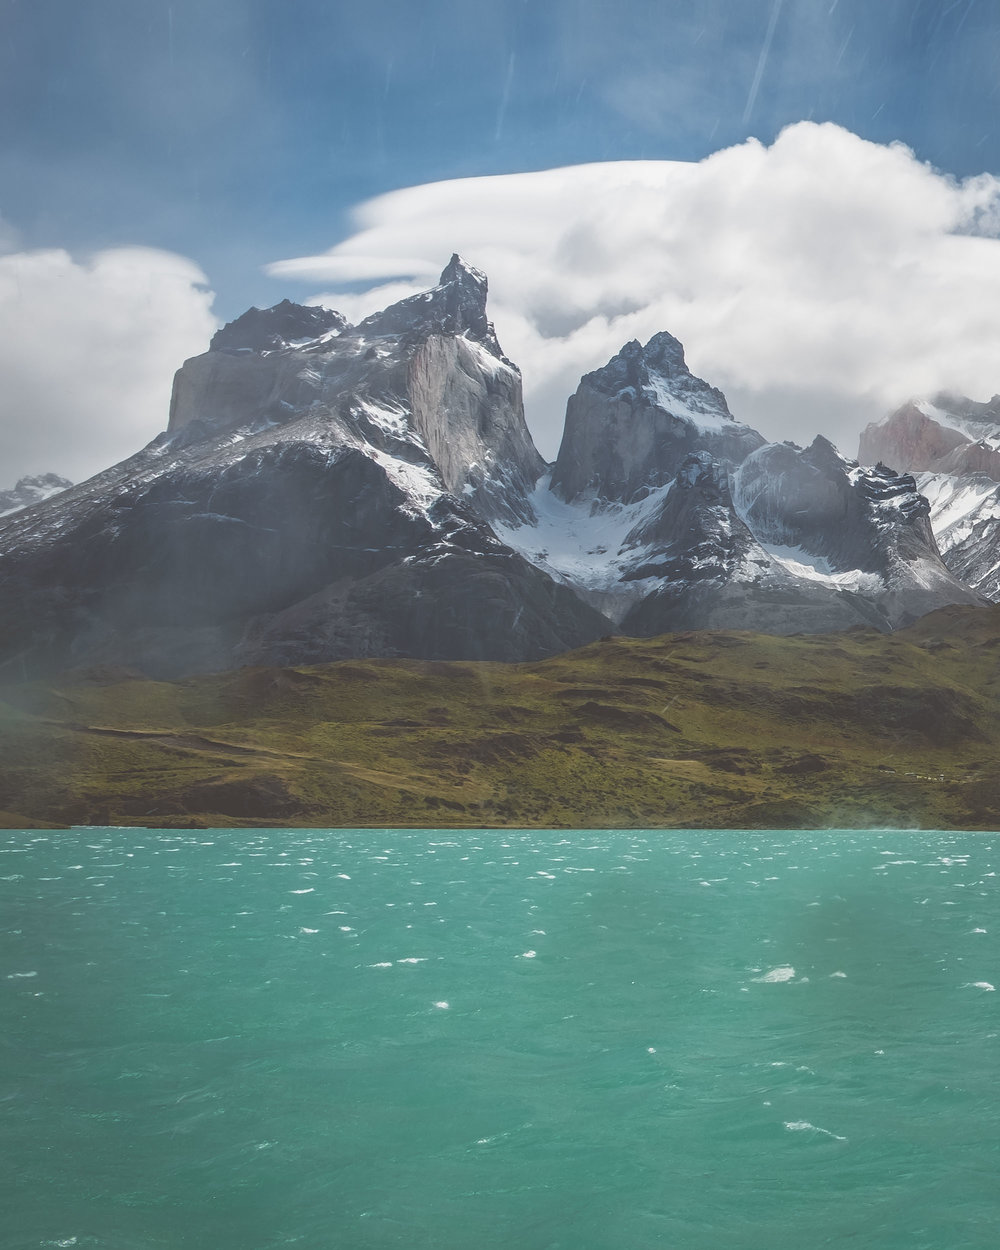 Chile-20171217-004584.jpg